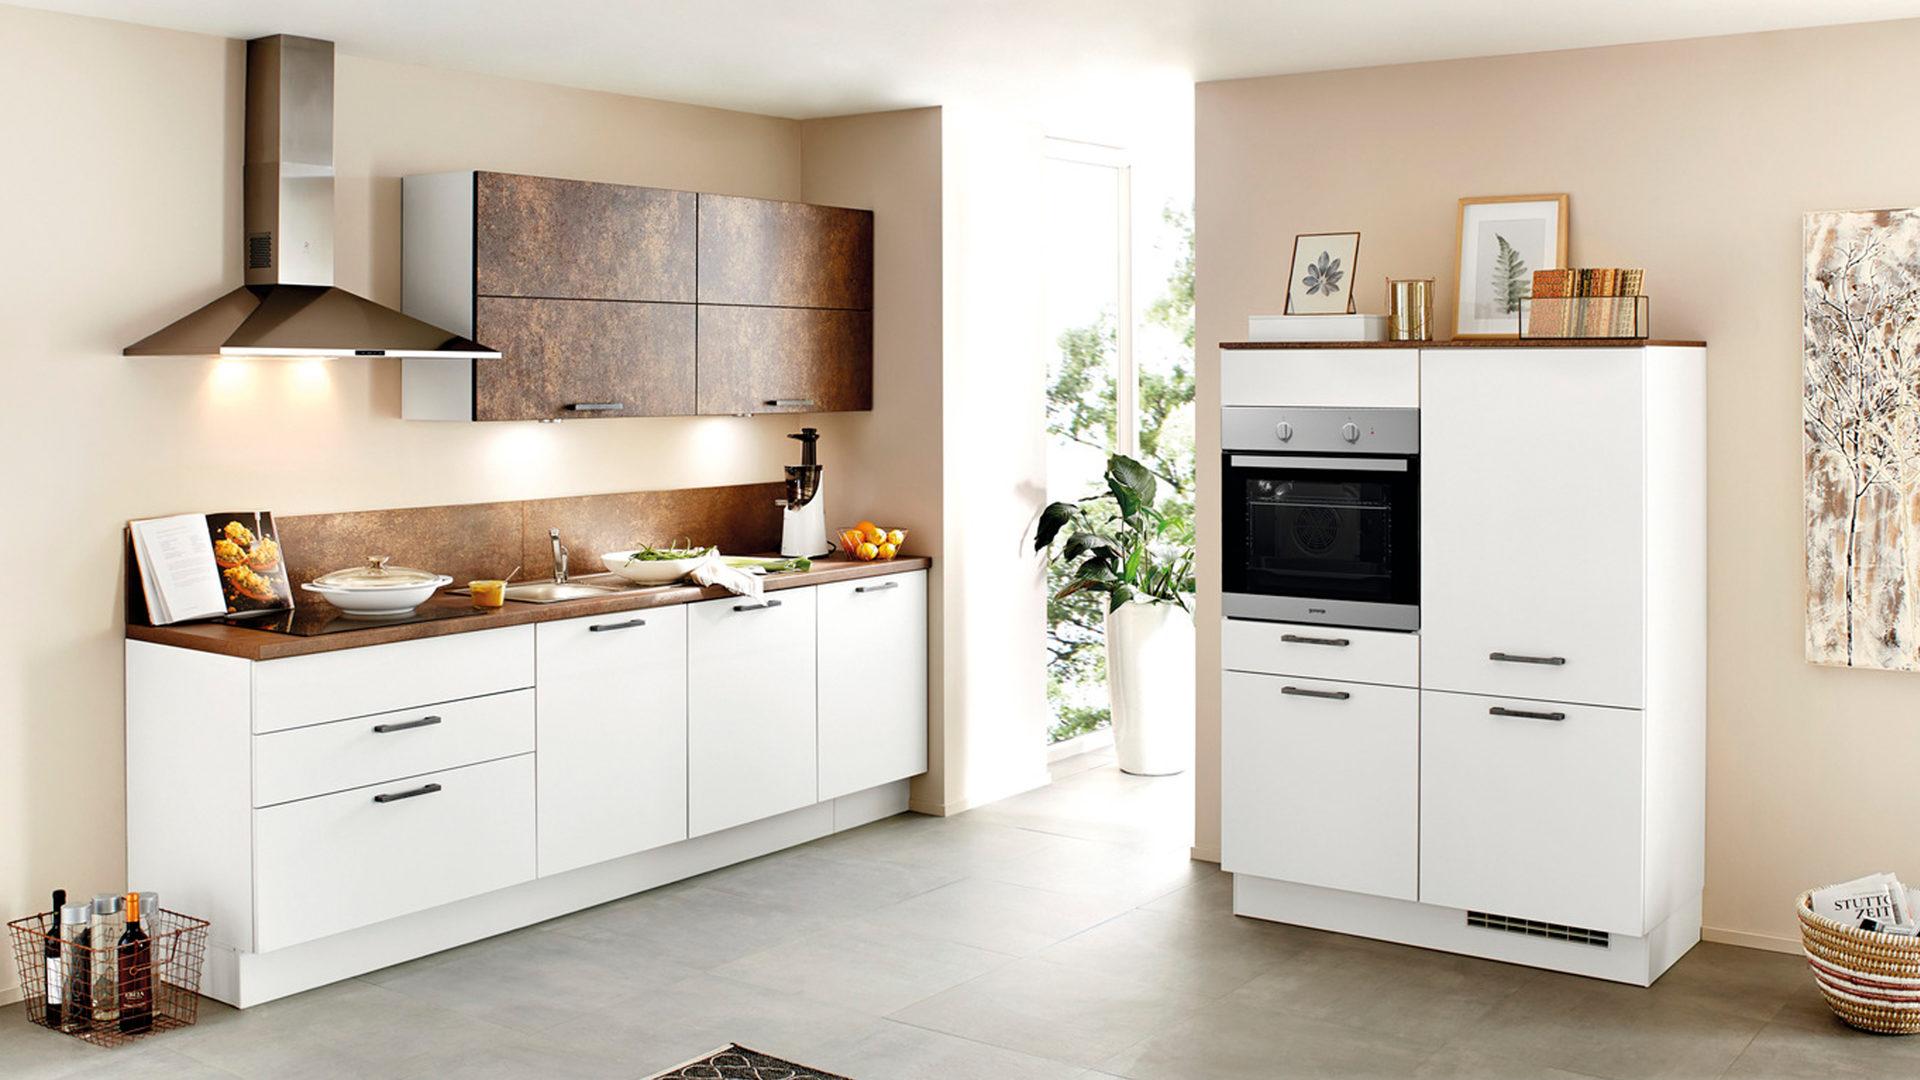 Gorenje Kühlschrank Hornbach : Arbeitsplatten küche kaufen. küche modern u form ikea hängeschrank